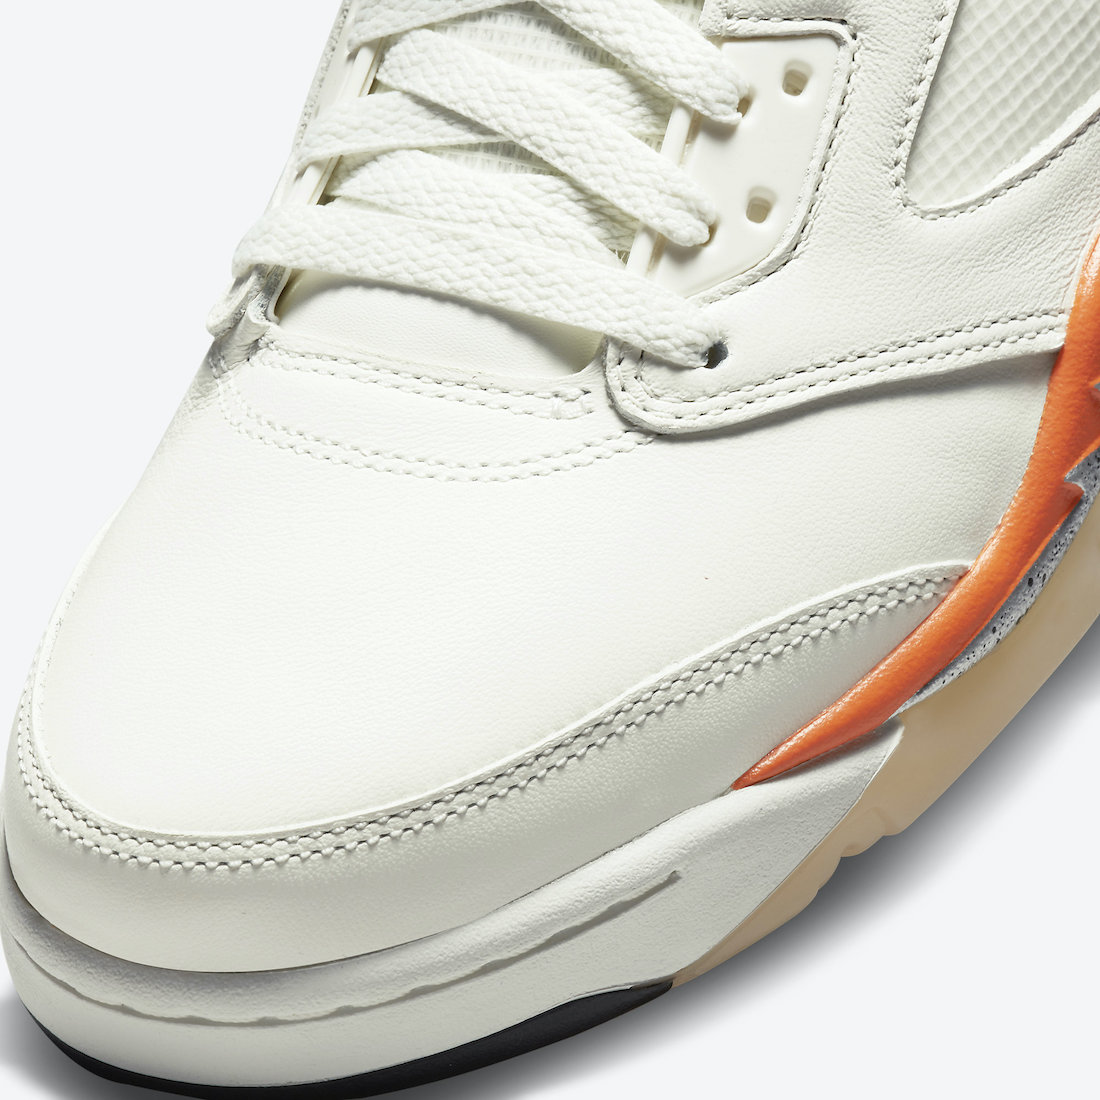 Air-Jordan-5-Shattered-Backboard-Orange-Blaze-DC1060-100-Release-Date-Price-6